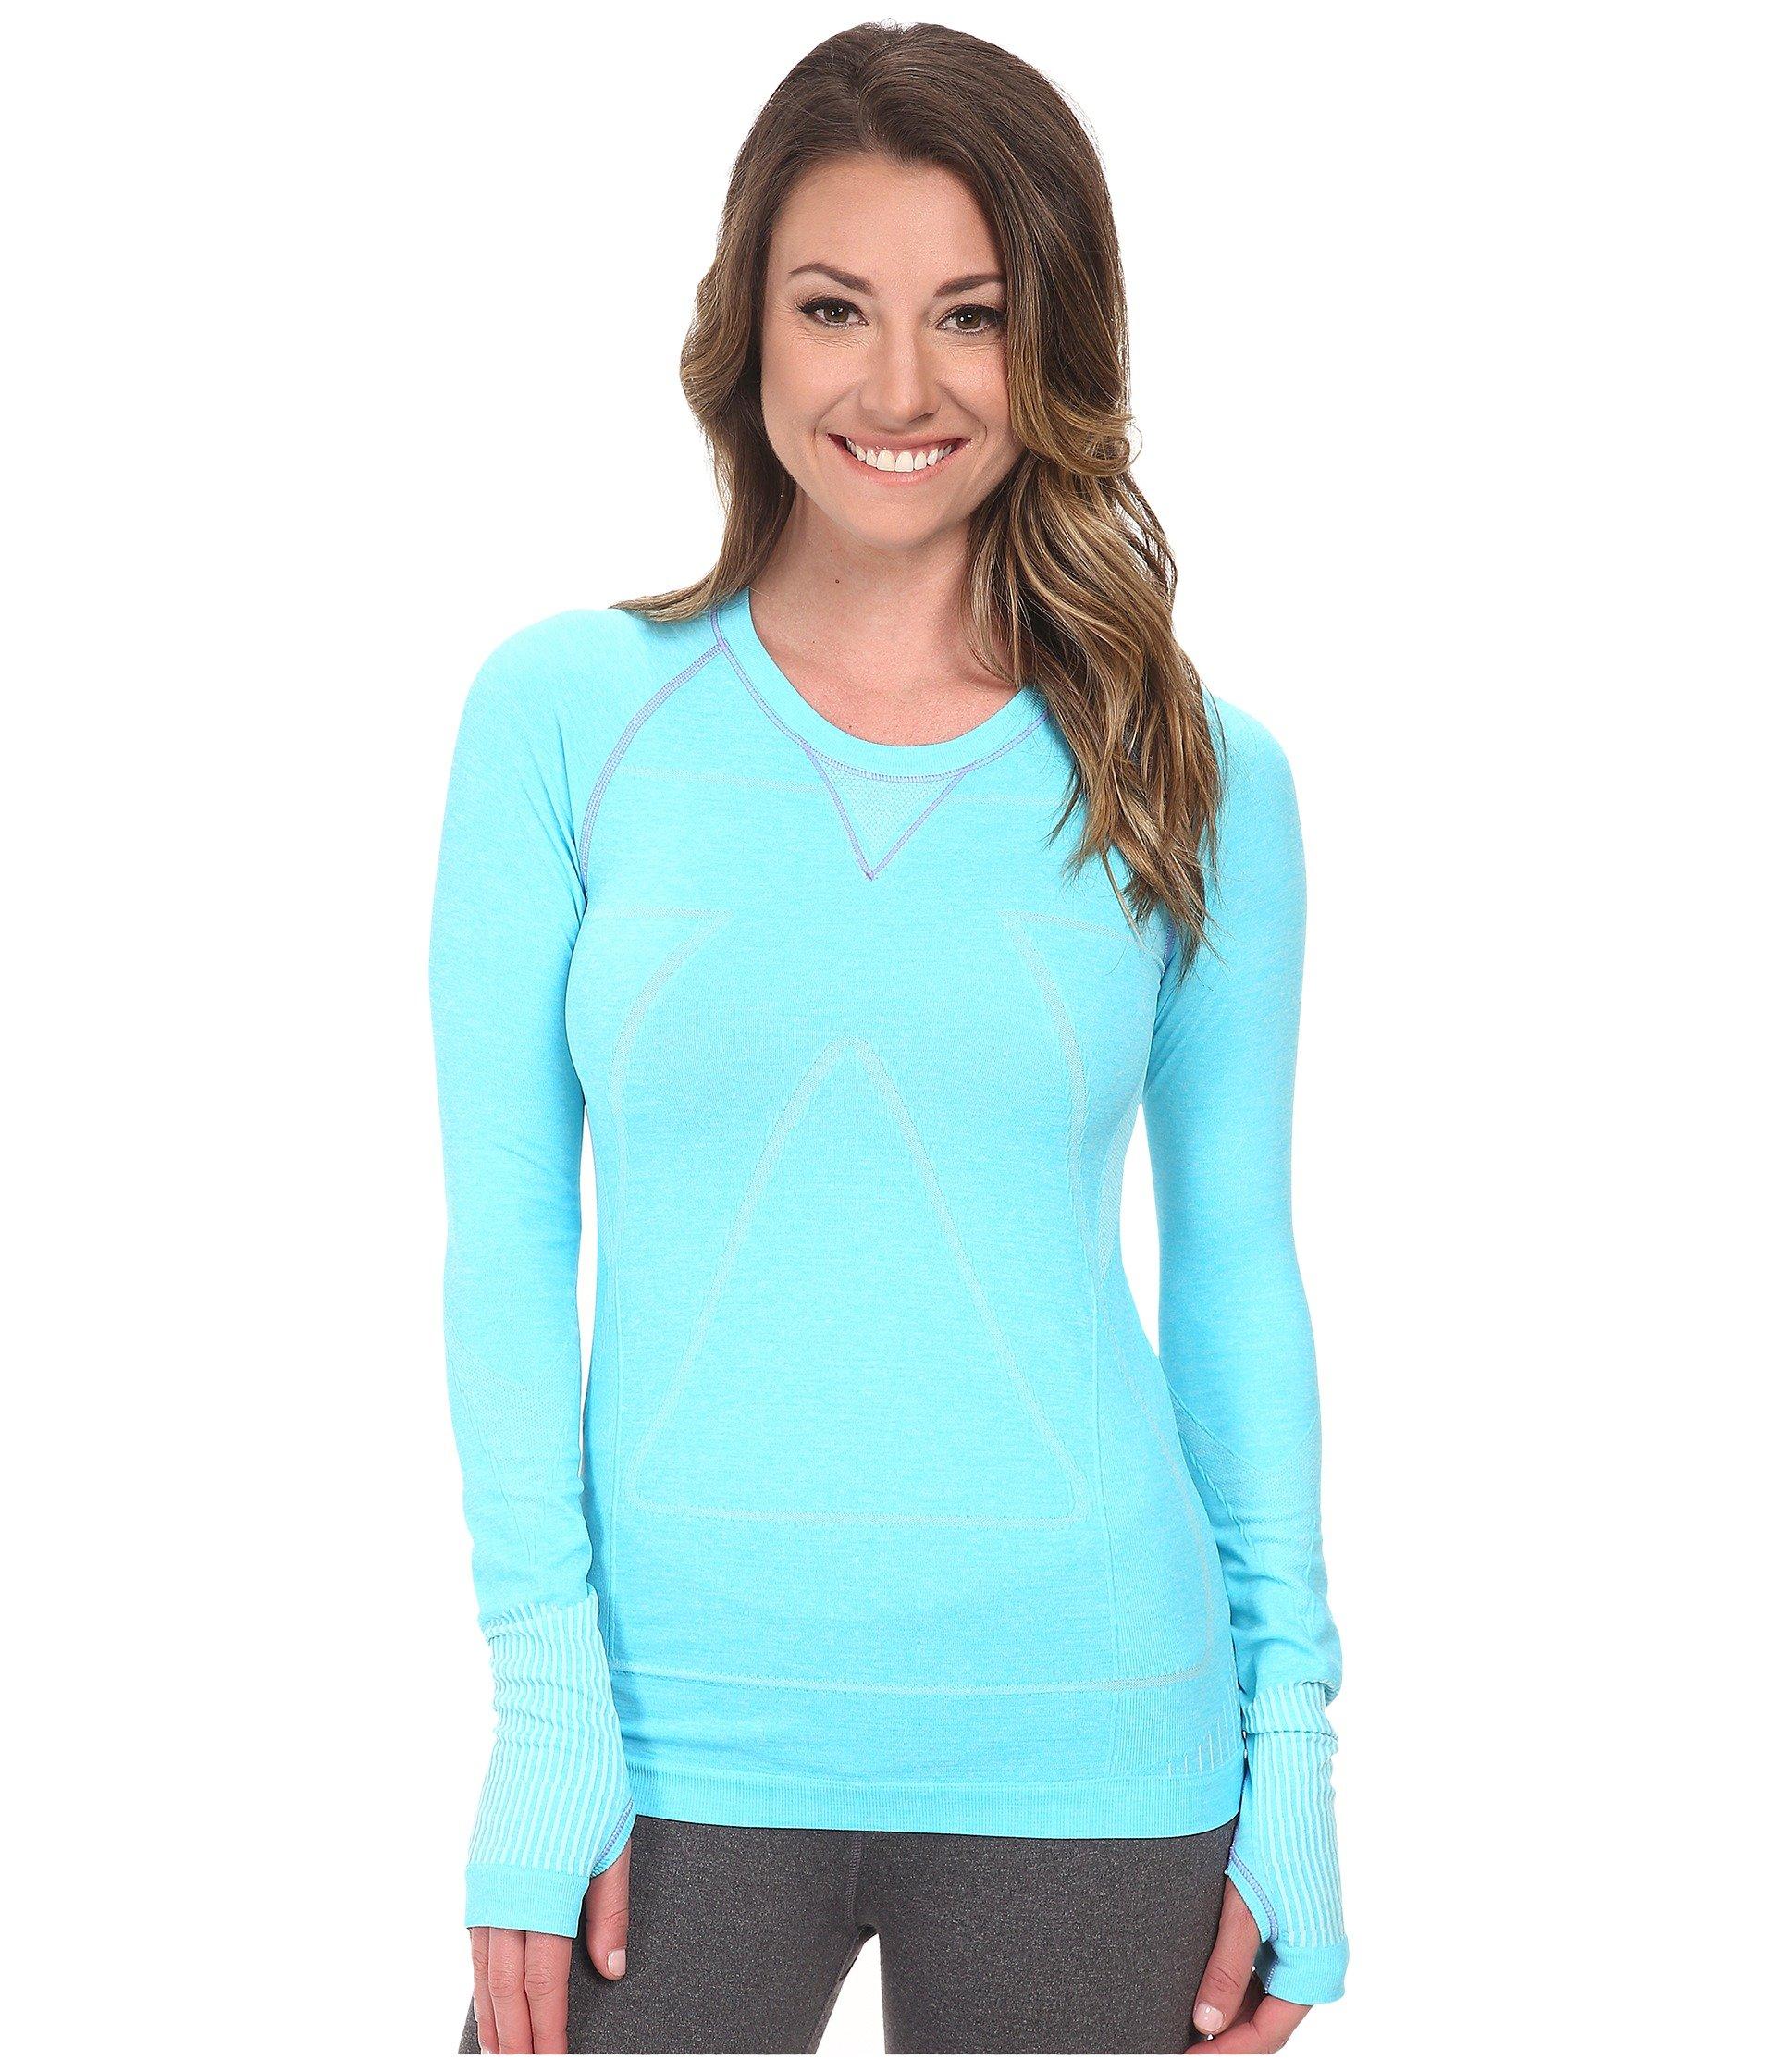 Aqua Sleeve Seamless Long Run Heather Zensah Shirt xTB0w1Ygq